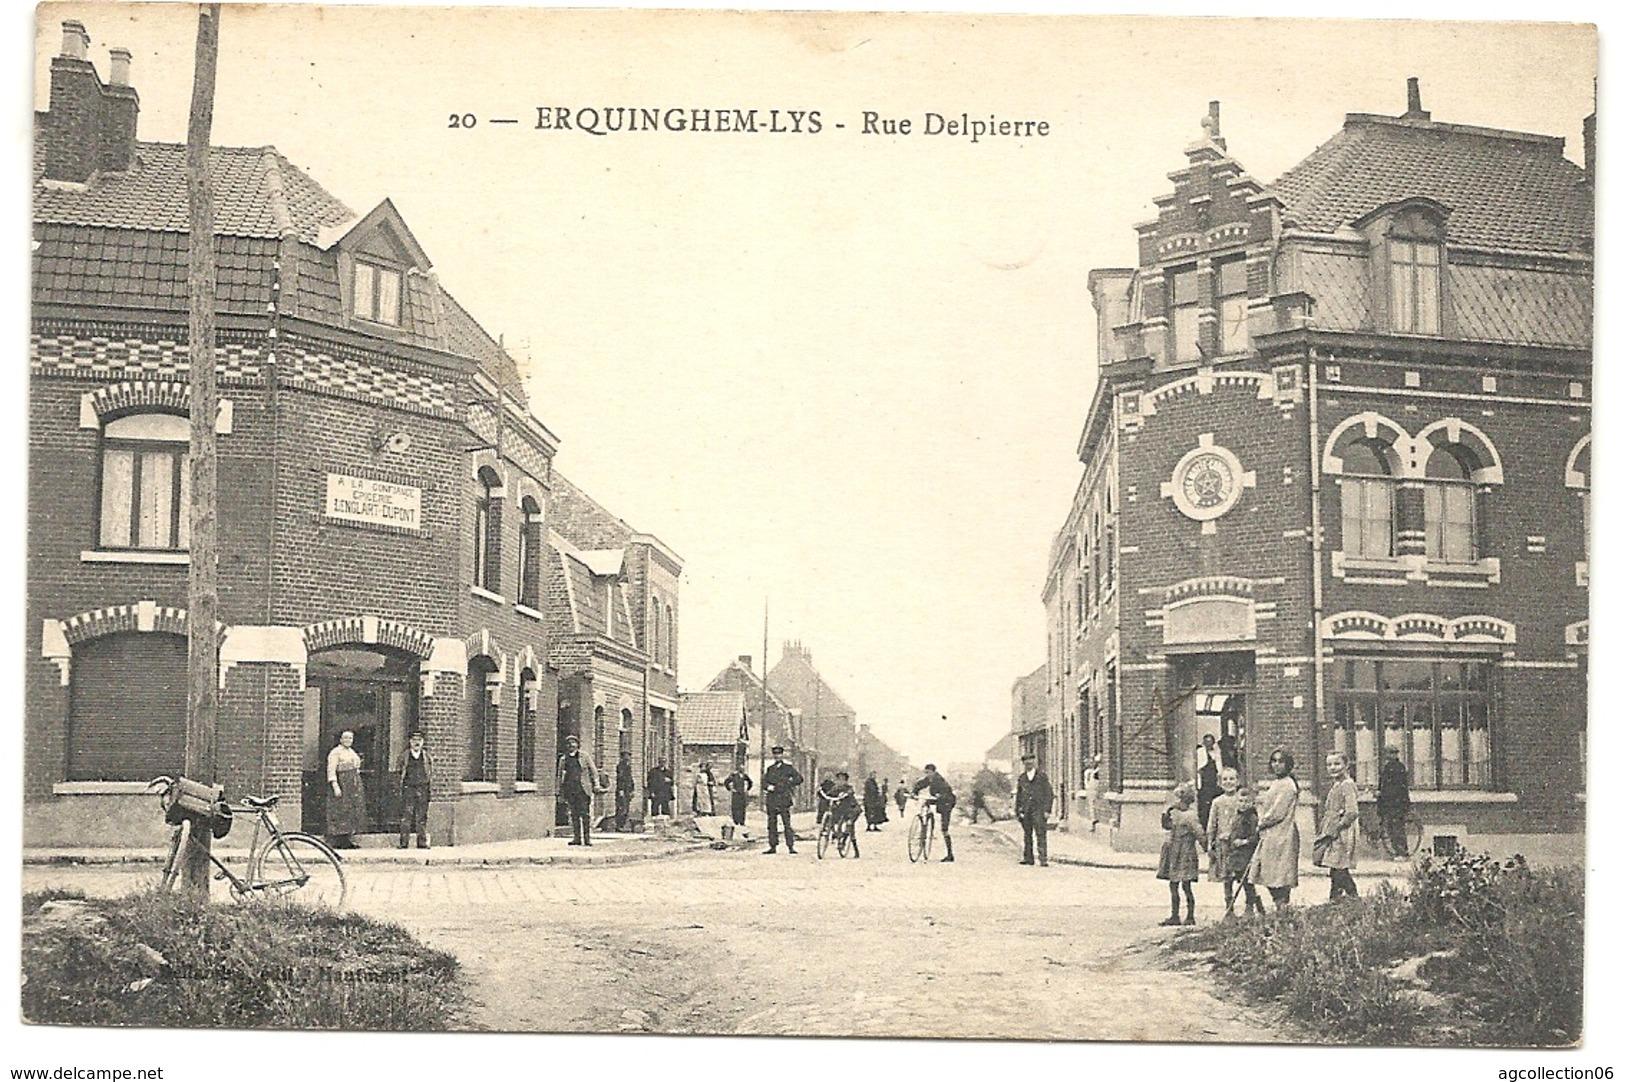 *ERQUINGHEM-LYS. RUE DELPIERRE - France